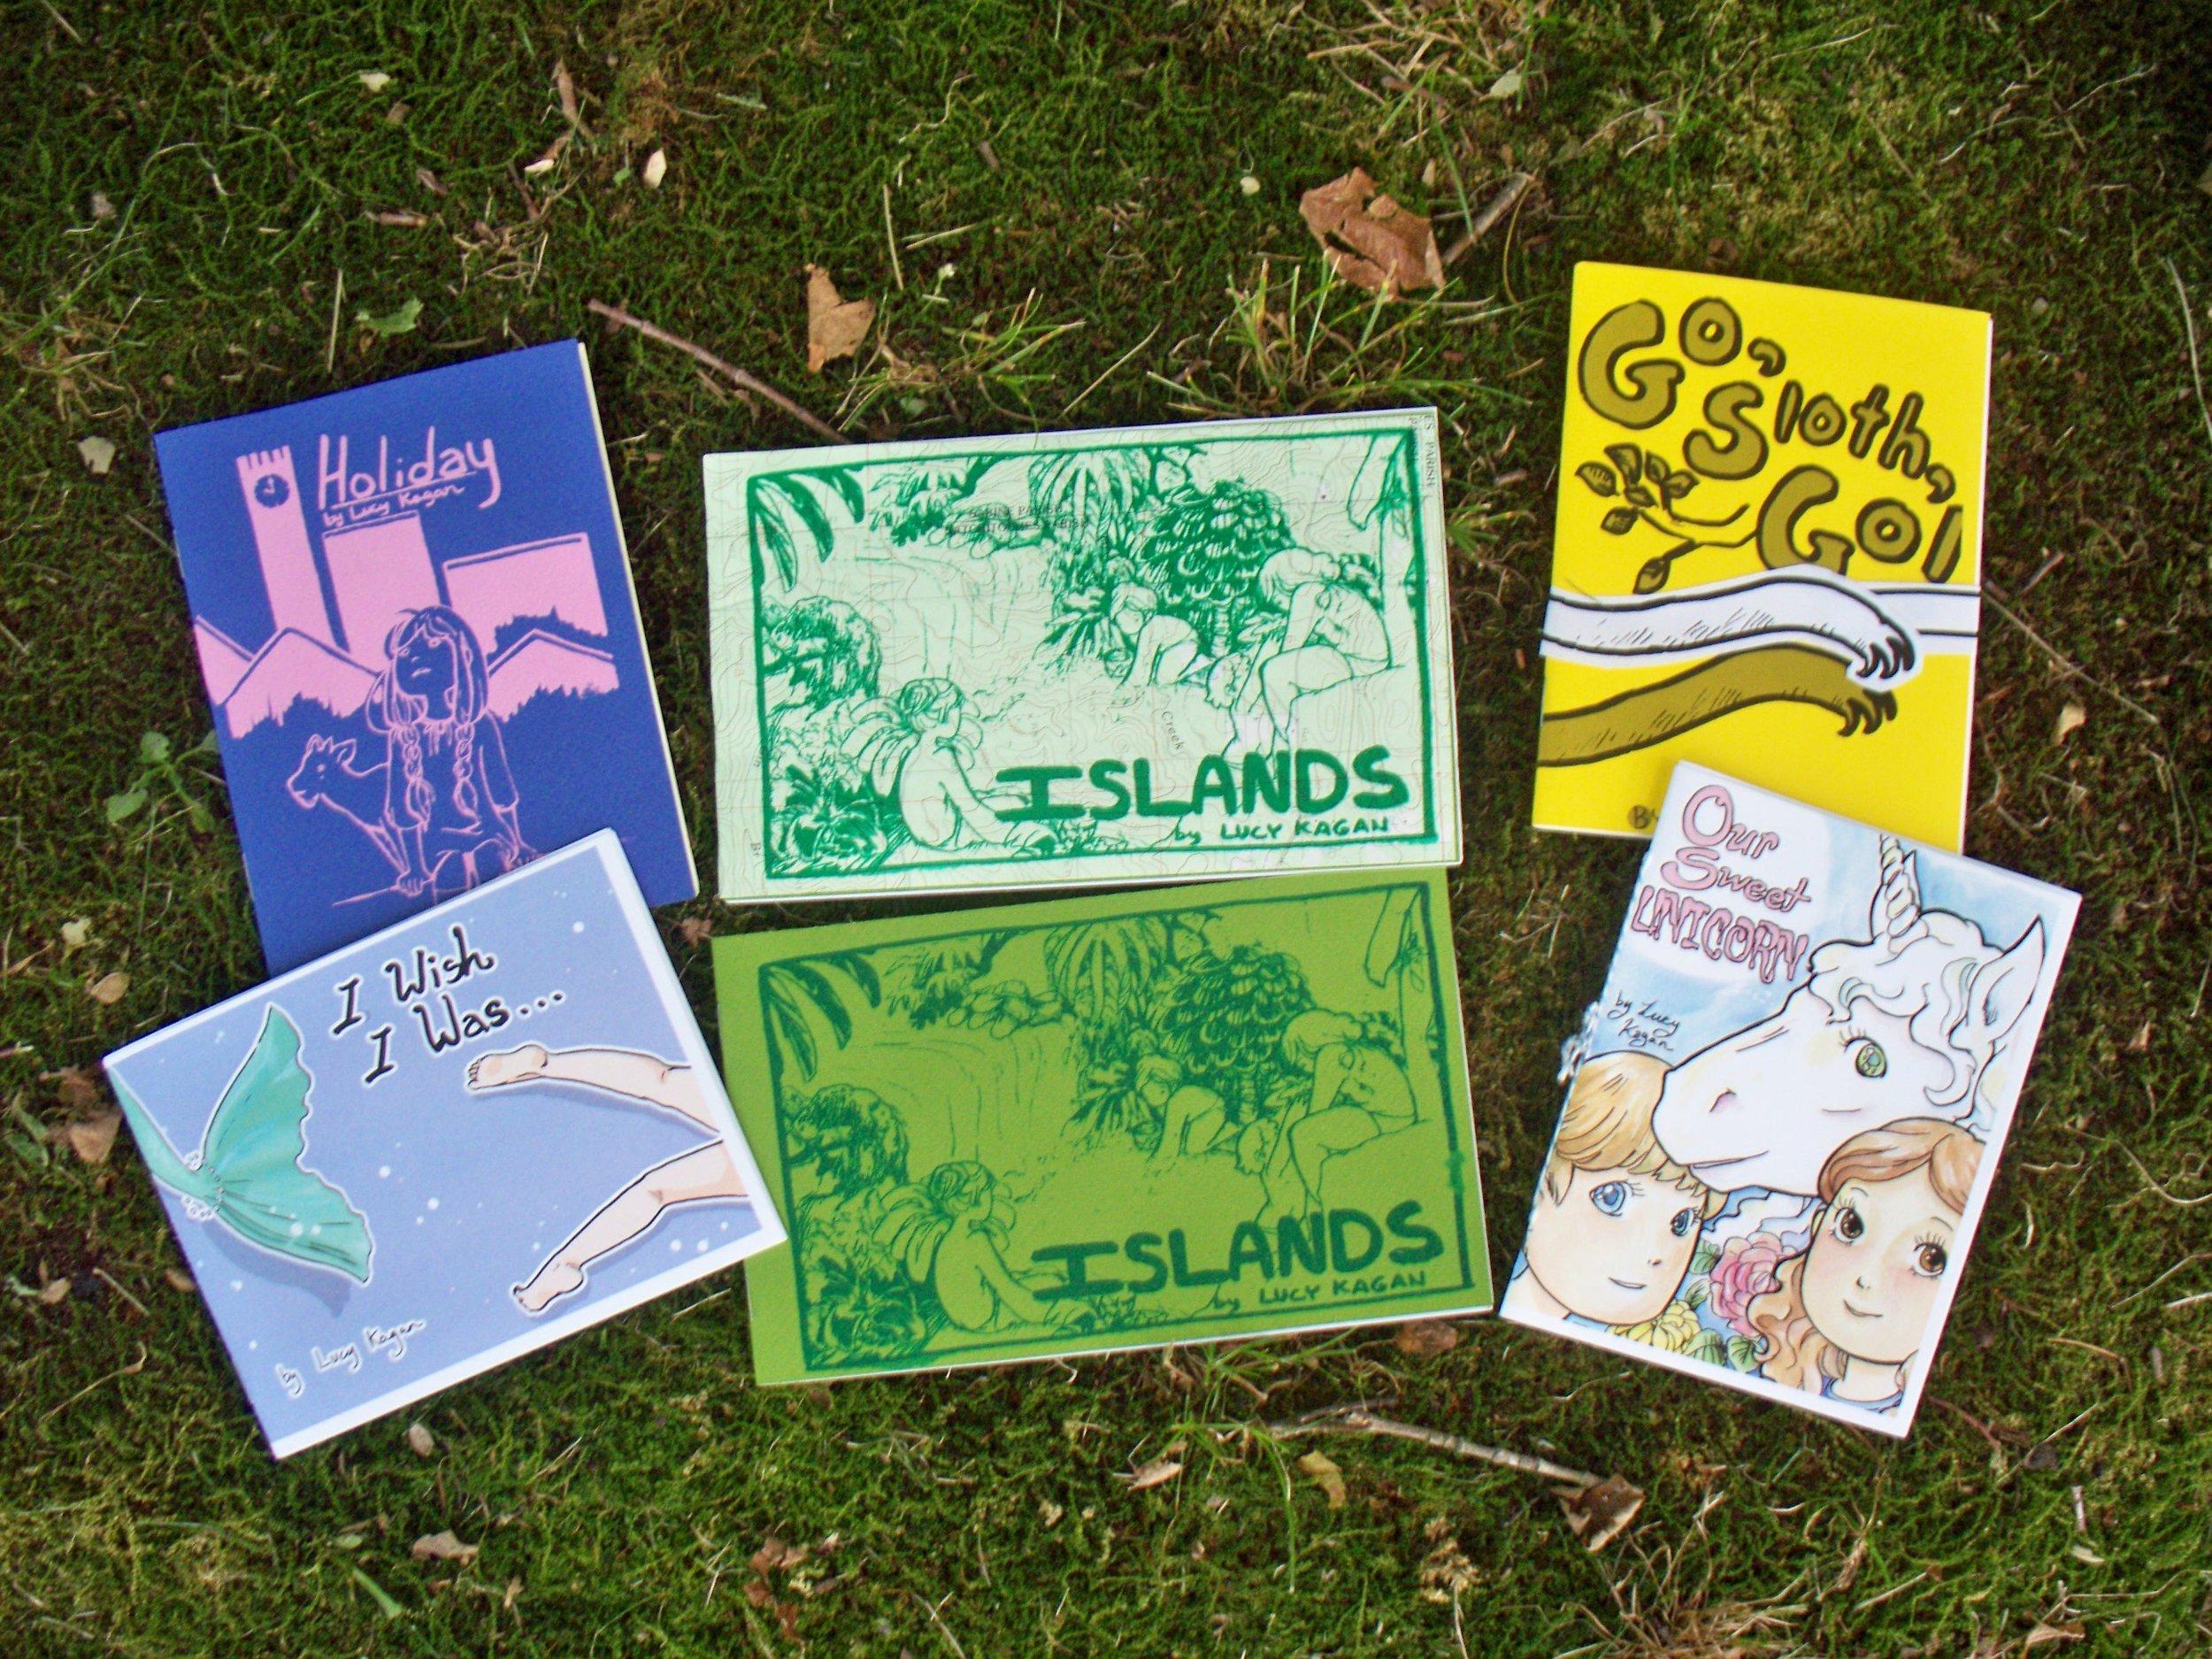 Various Minicomics by Lucy Kagan